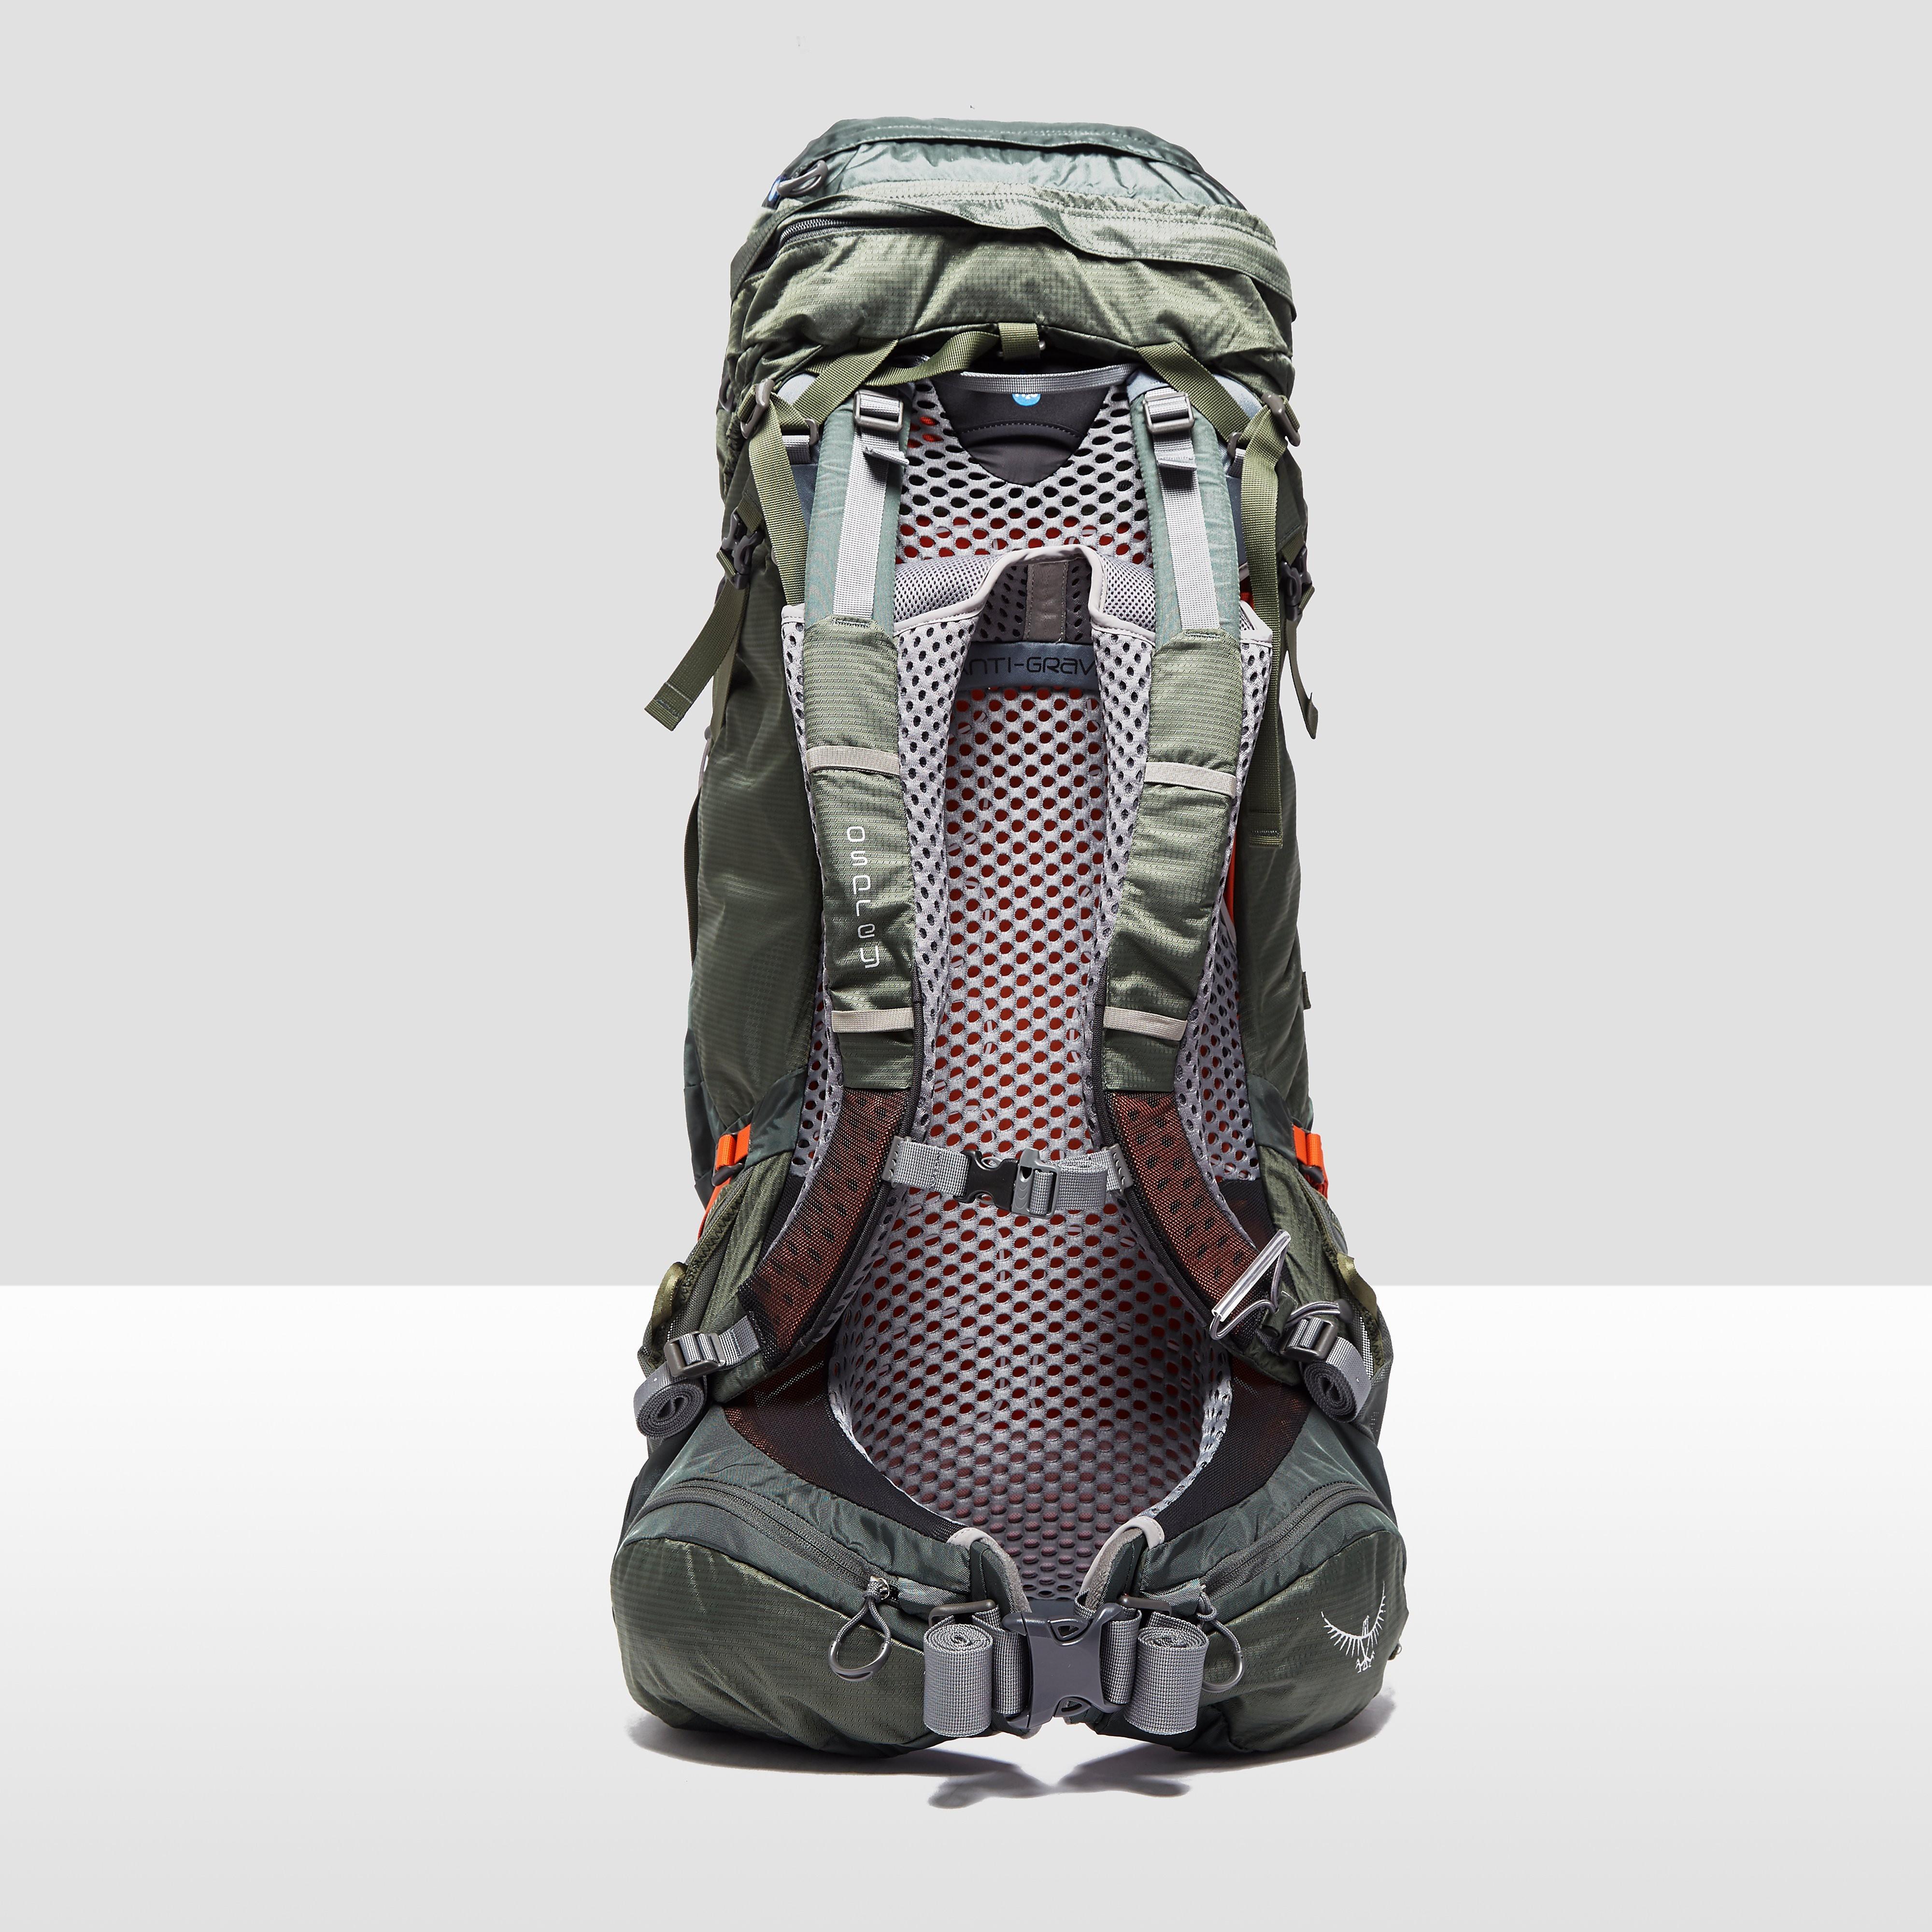 Osprey Atmos AG 65 Backpack (Large)